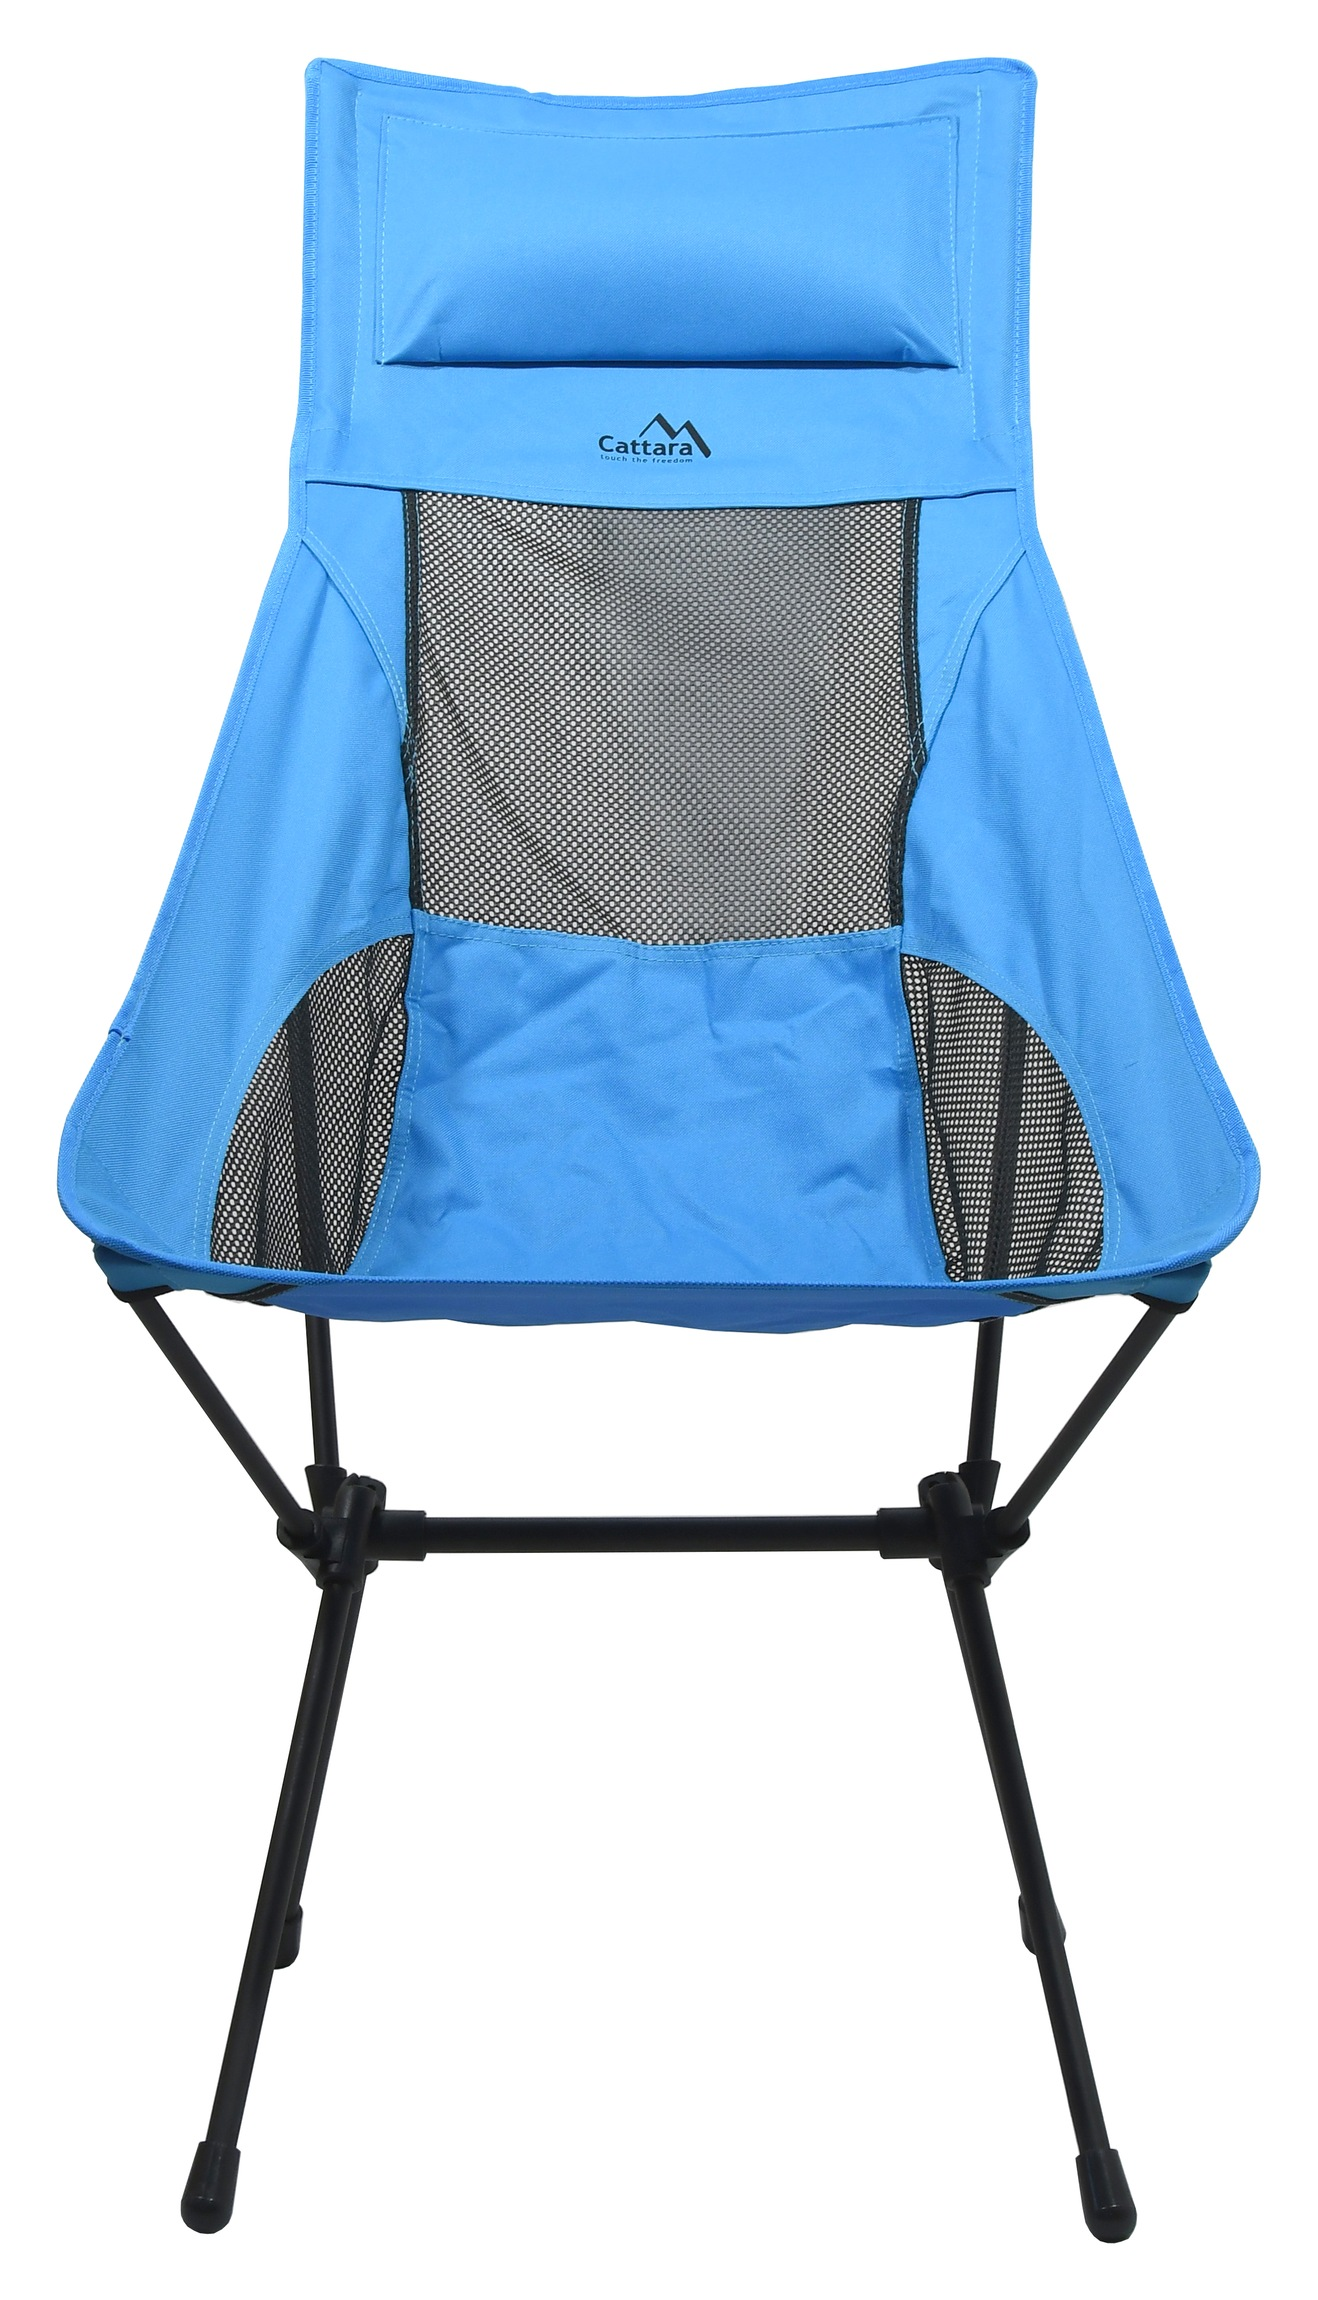 Cattara - Židle kempingová skládací FOLDI MAX III